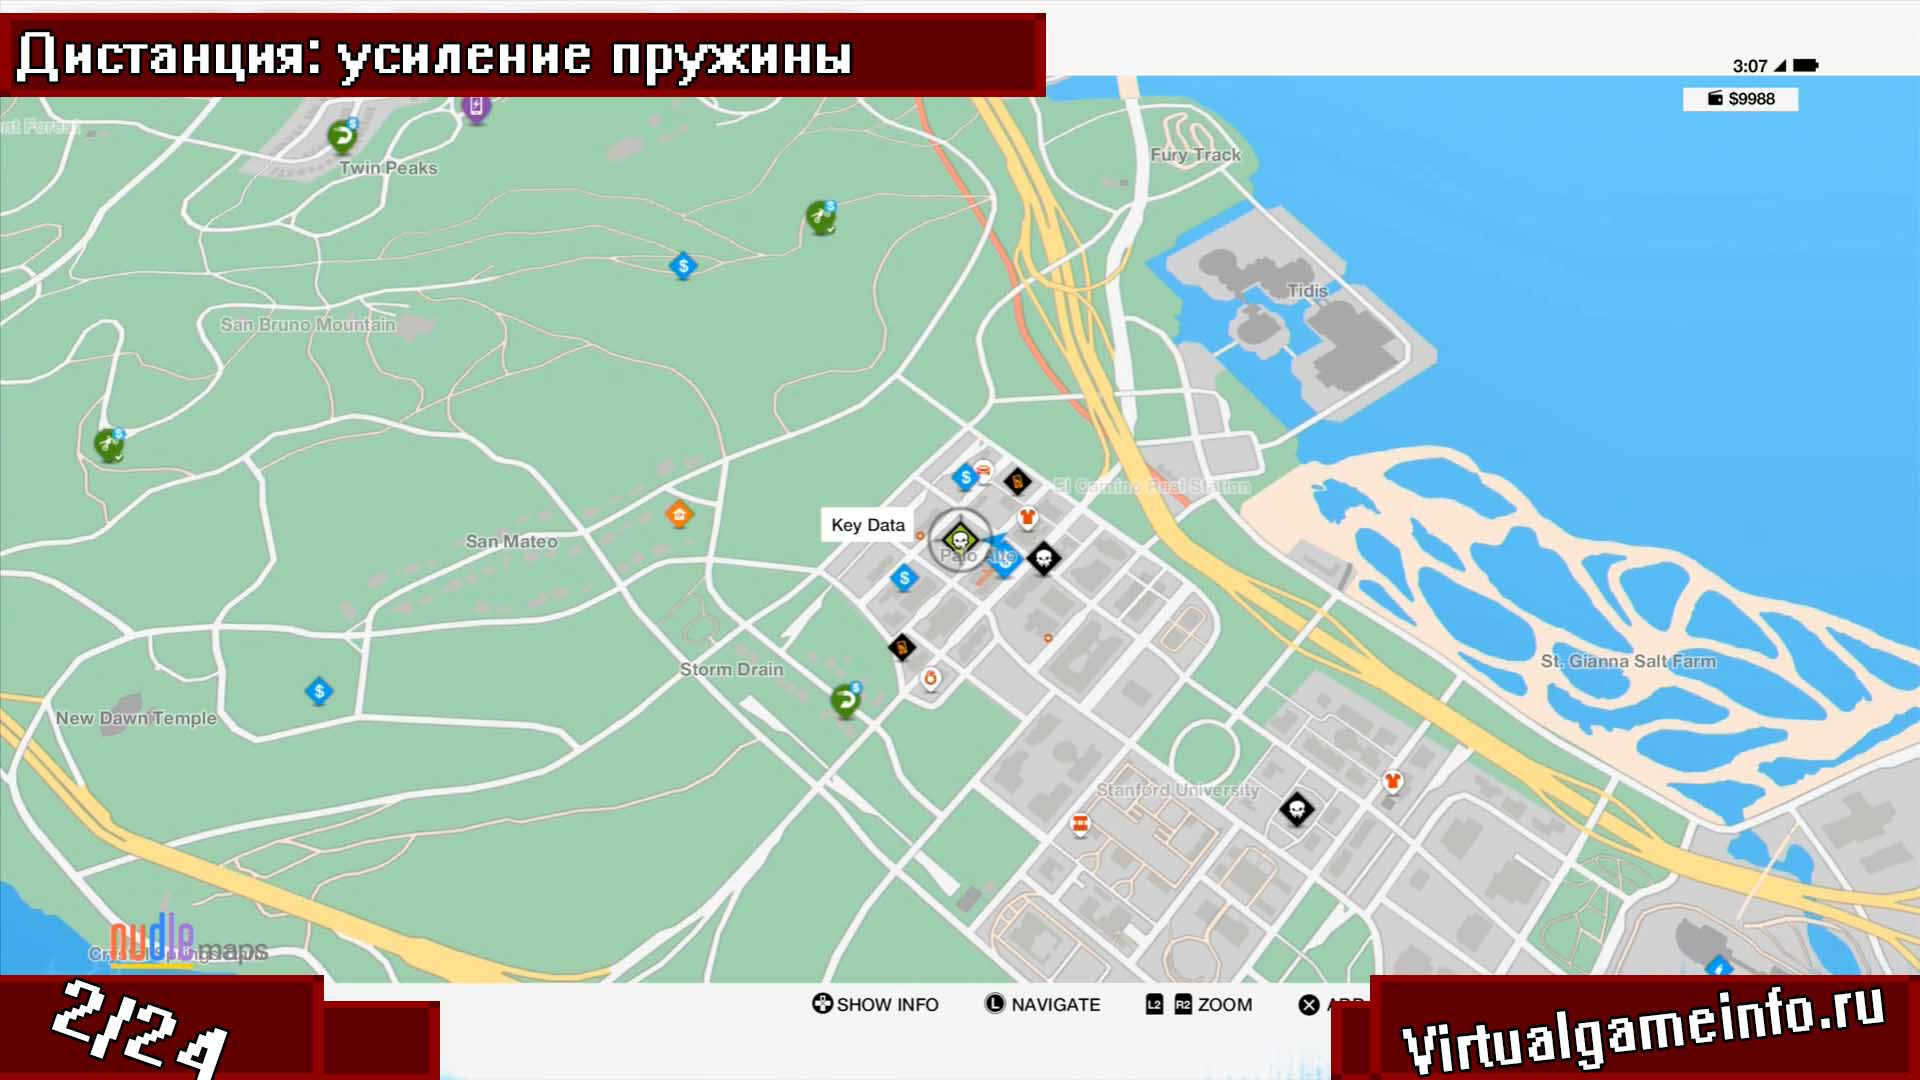 Watch dogs 2 пало альто ключевые данные — VirtualGameInfo.ru